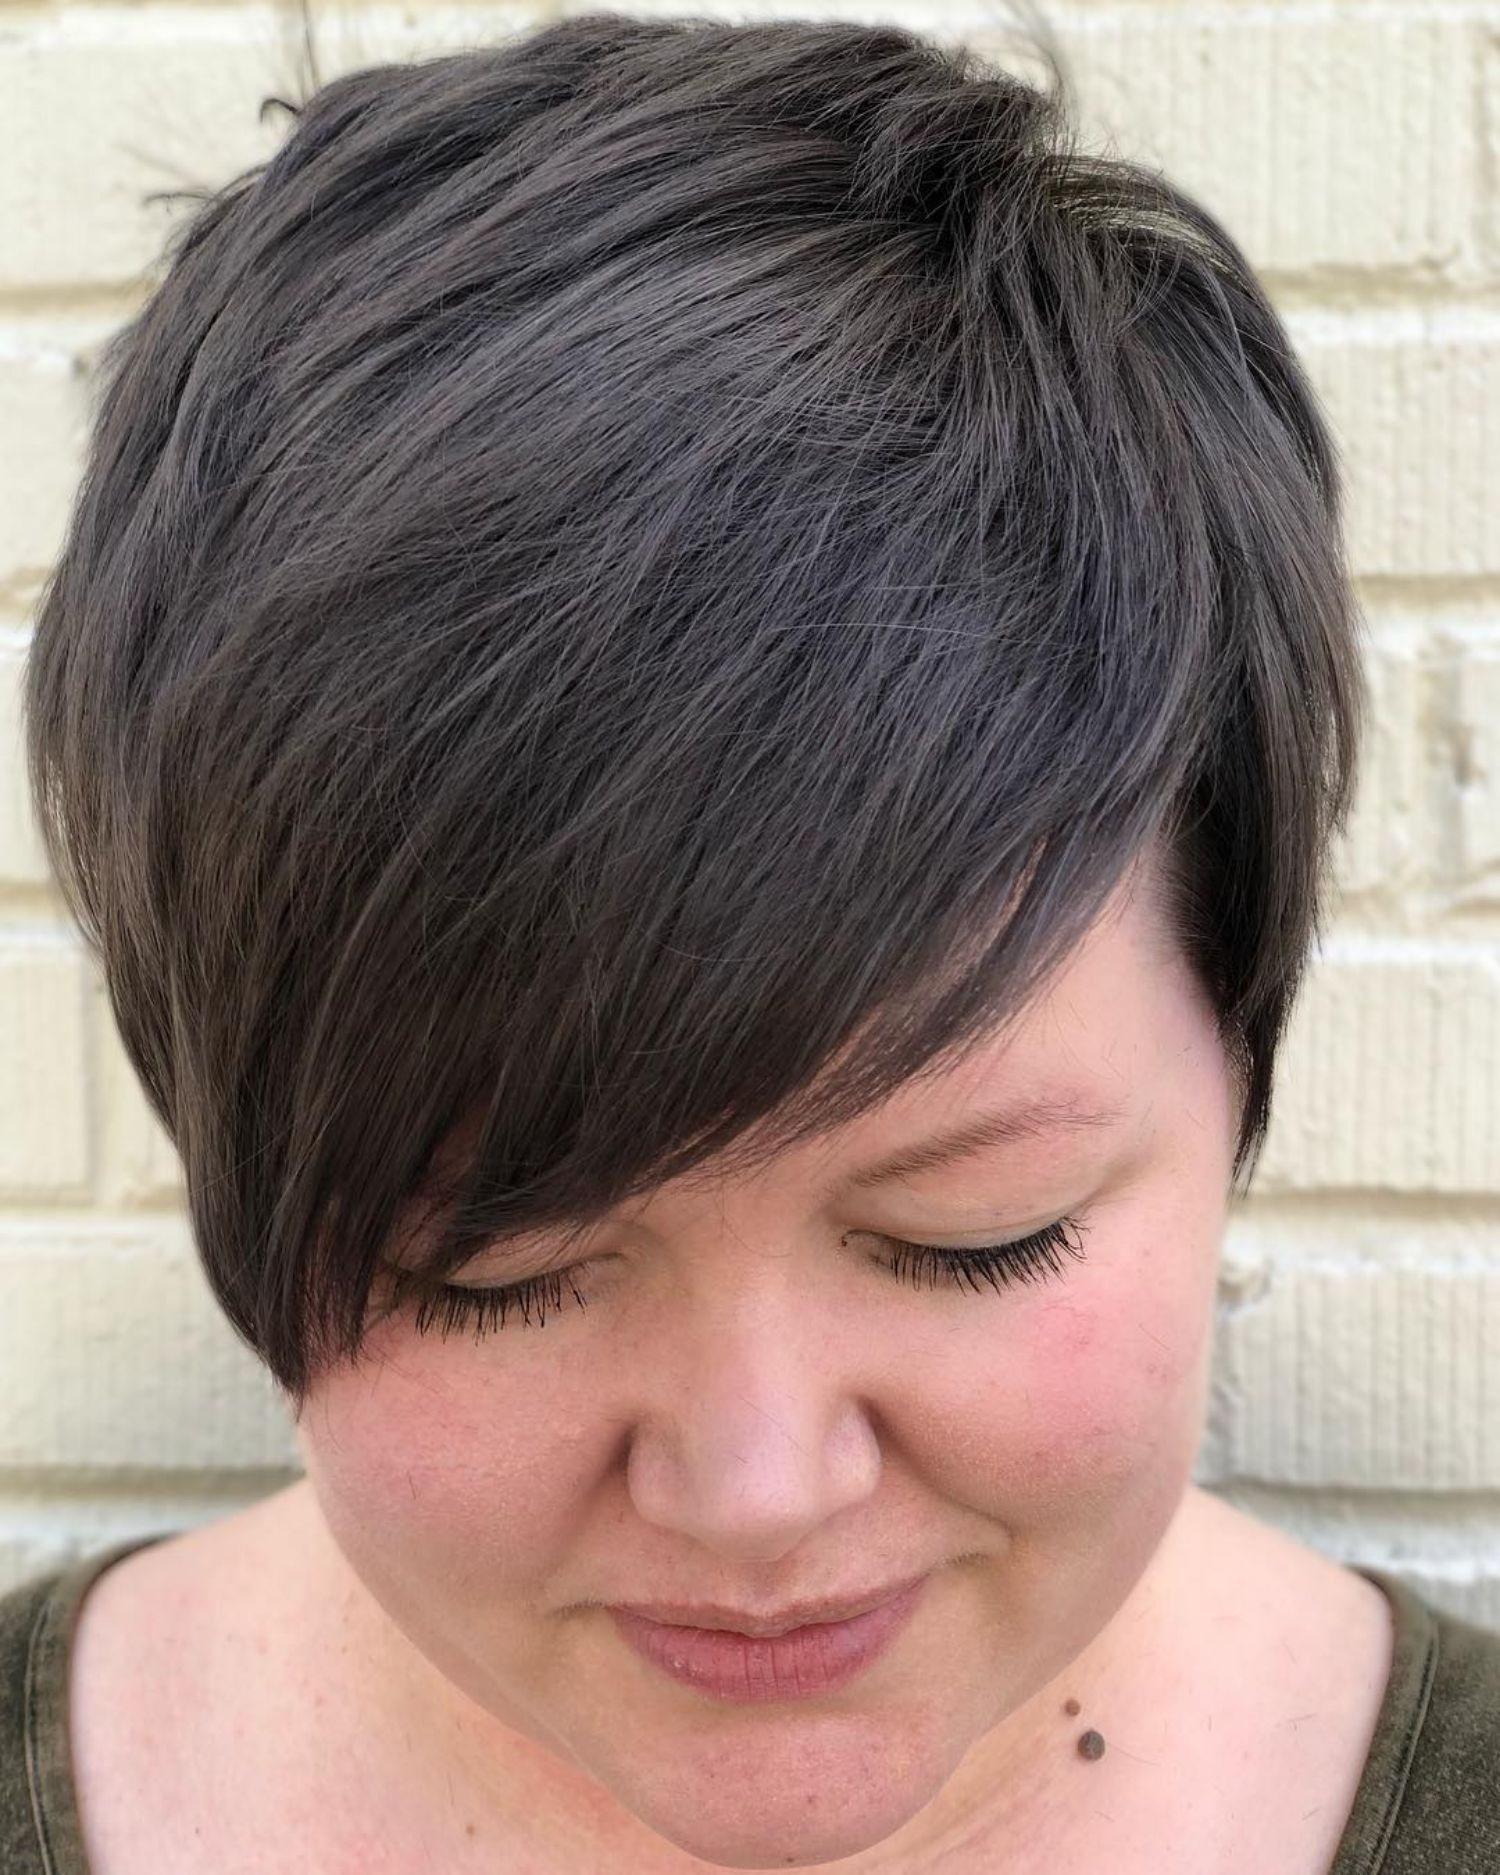 Chubby Brunette Short Hair 25 Pretty Short Haircuts